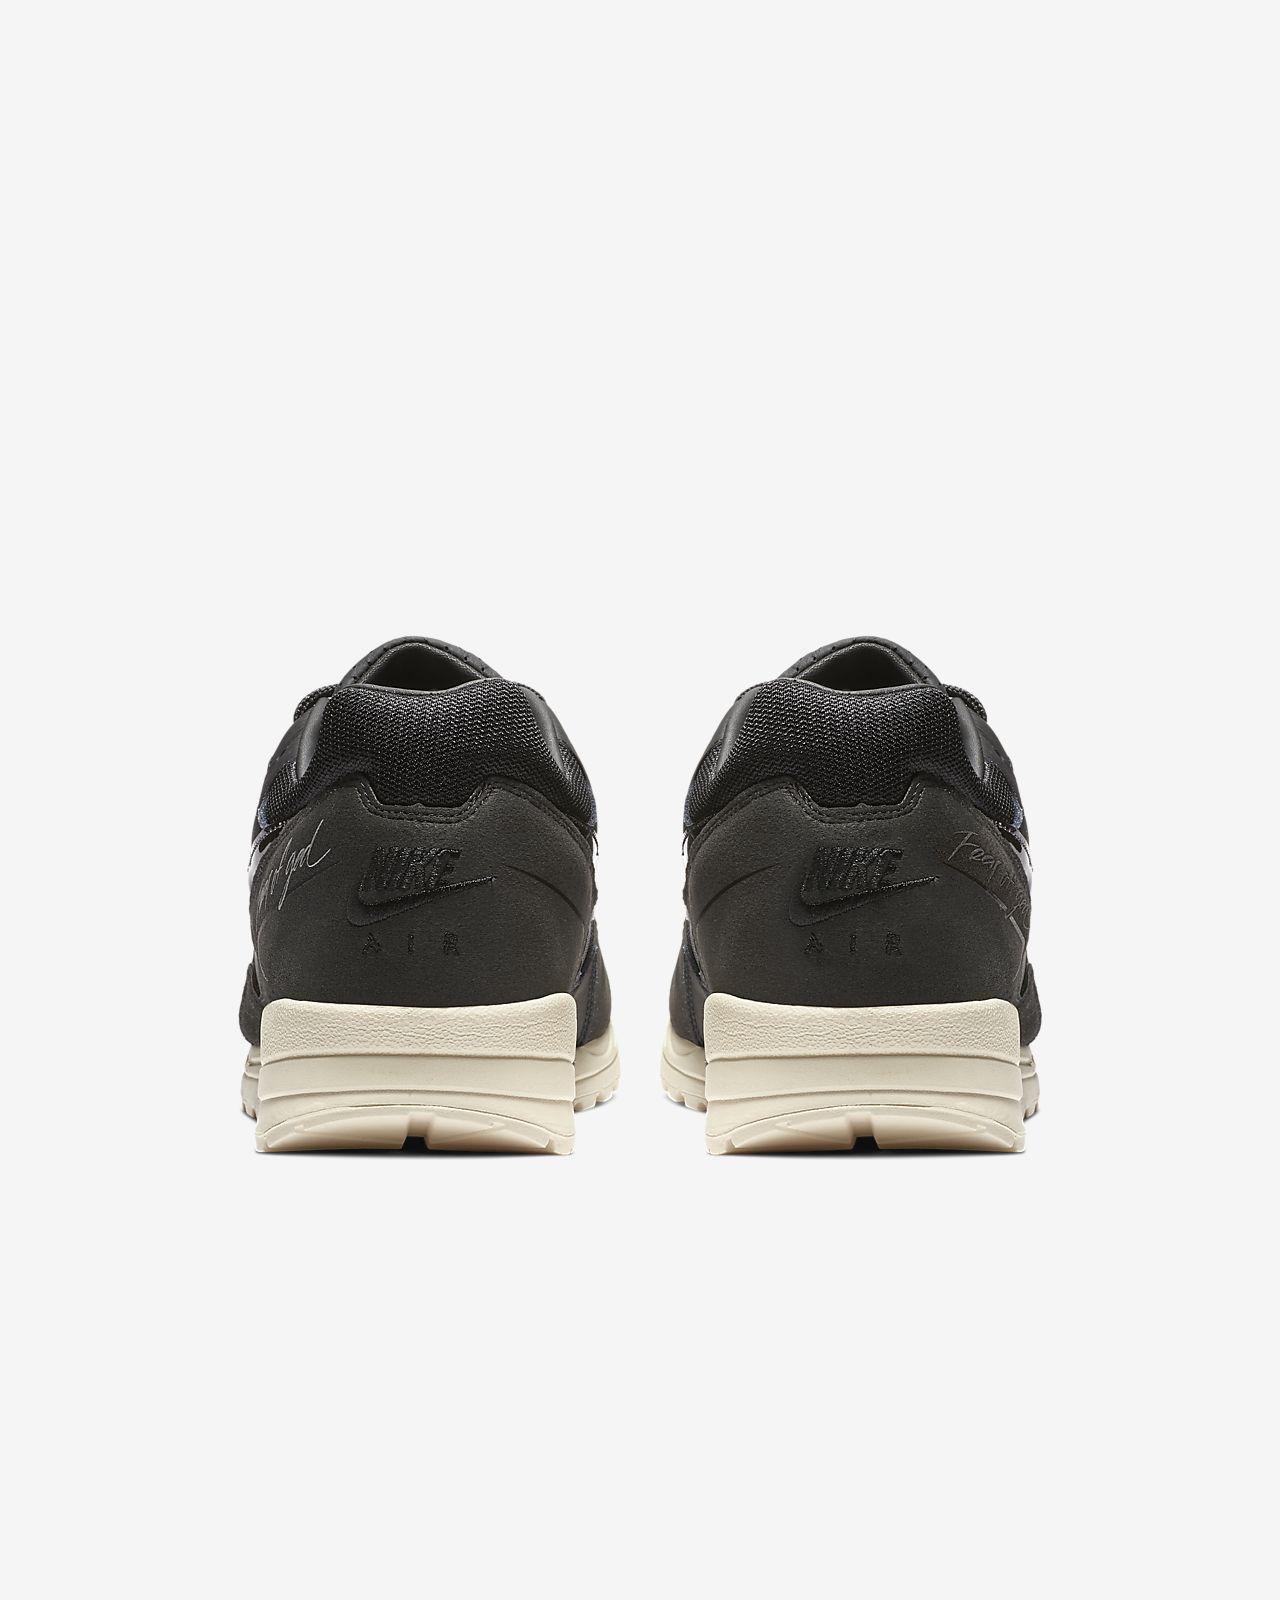 buy online f32cb 440ab ... Nike Air Skylon II x Fear of God Men s Shoe